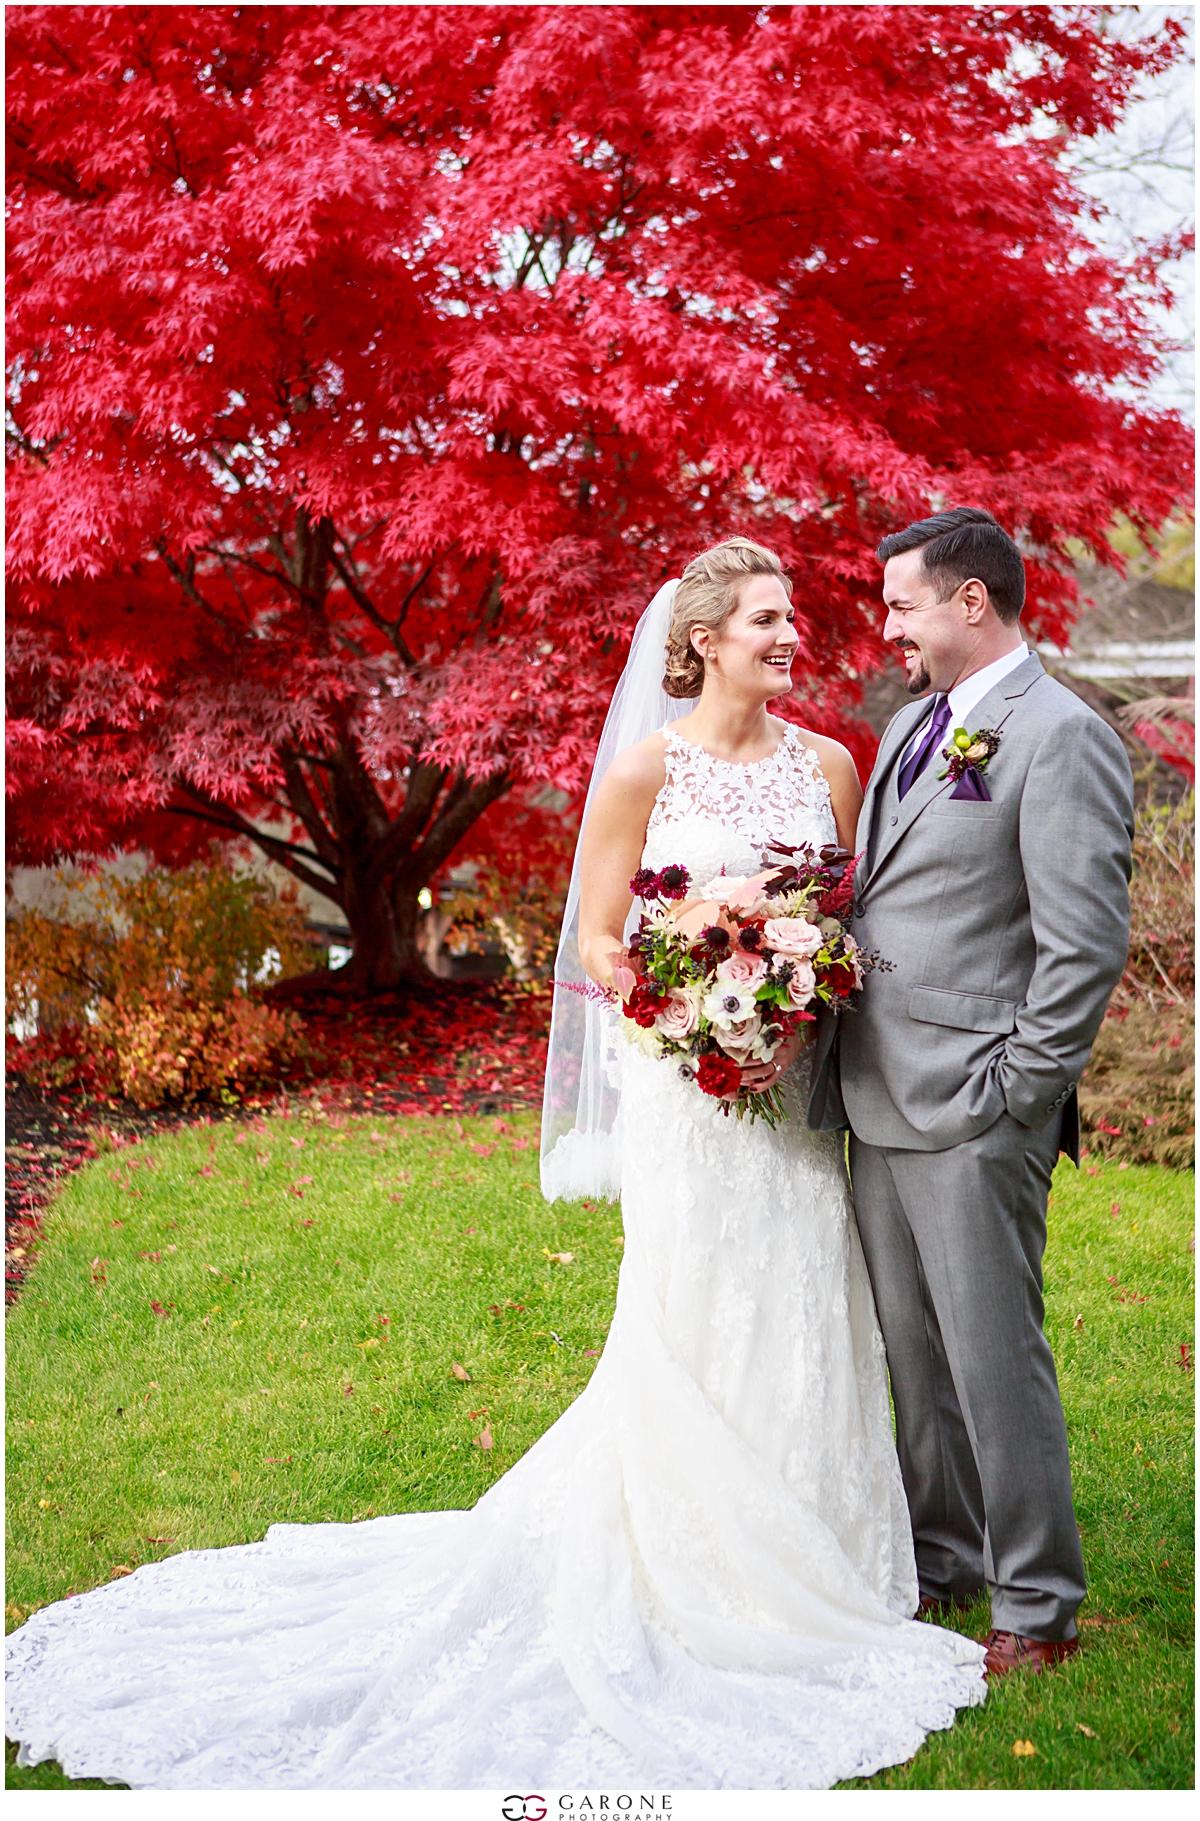 Kate_Chris_Atlantica_Cohasset_Massachusettes_Boston_Wedding_Photography_Garone_Photography_0018.jpg